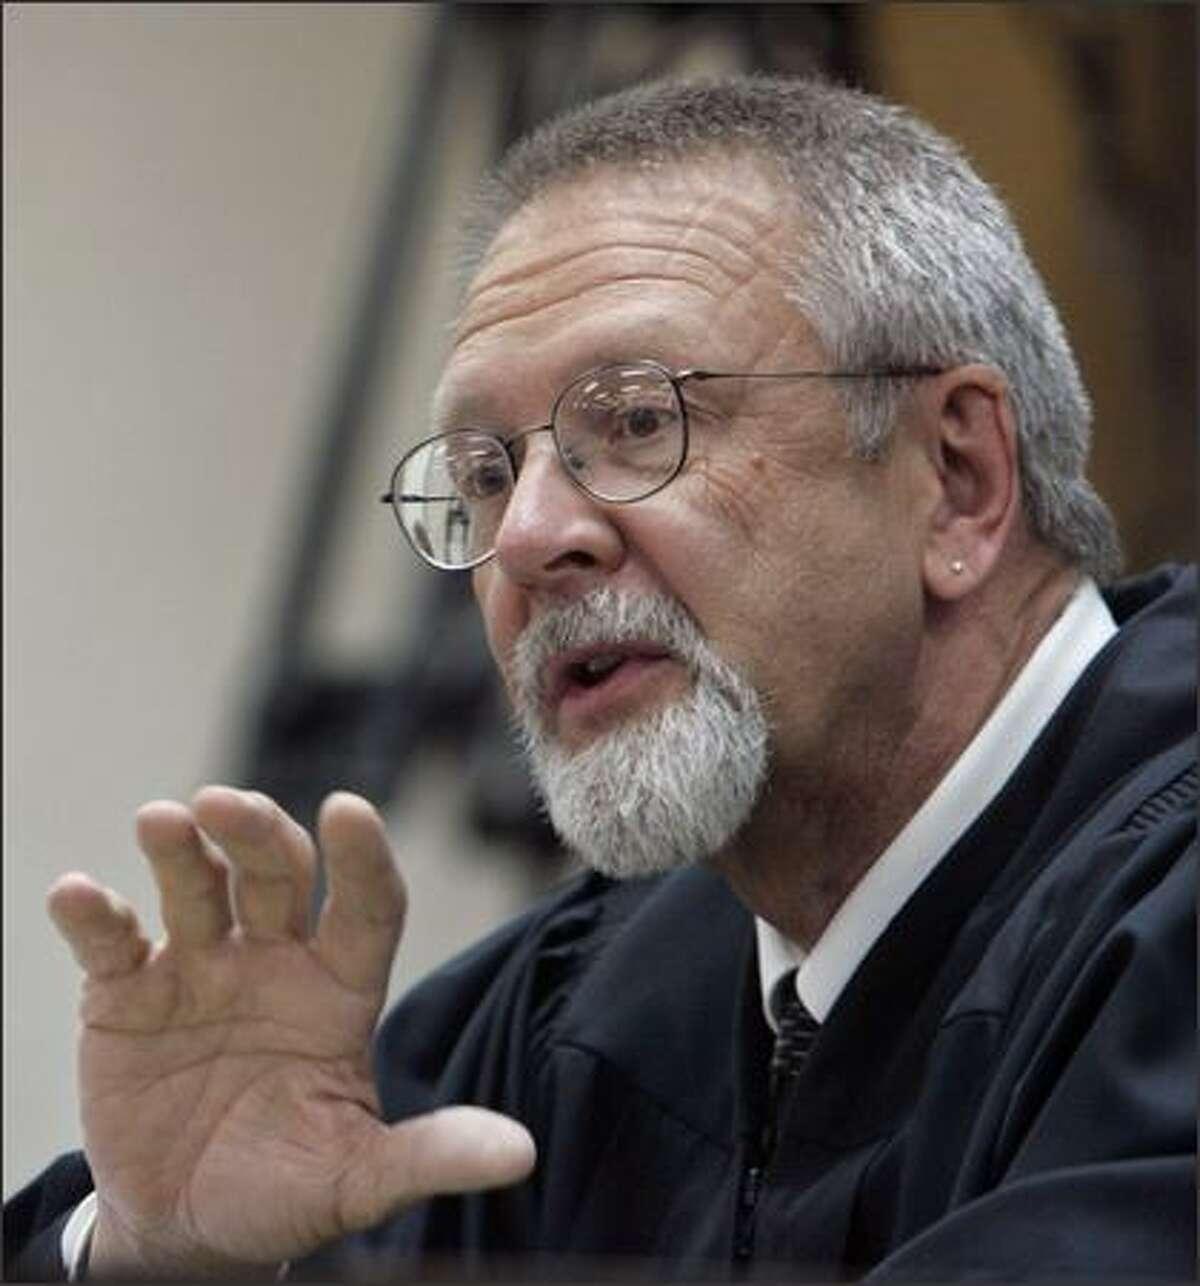 Judge John Bridges announces his verdict in the gubernatorial election challenge in Chelan County Superior Court Monday in Wenatchee. Bridges upheld Washington's 2004 gubernatorial election. (AP Photo/Elaine Thompson)